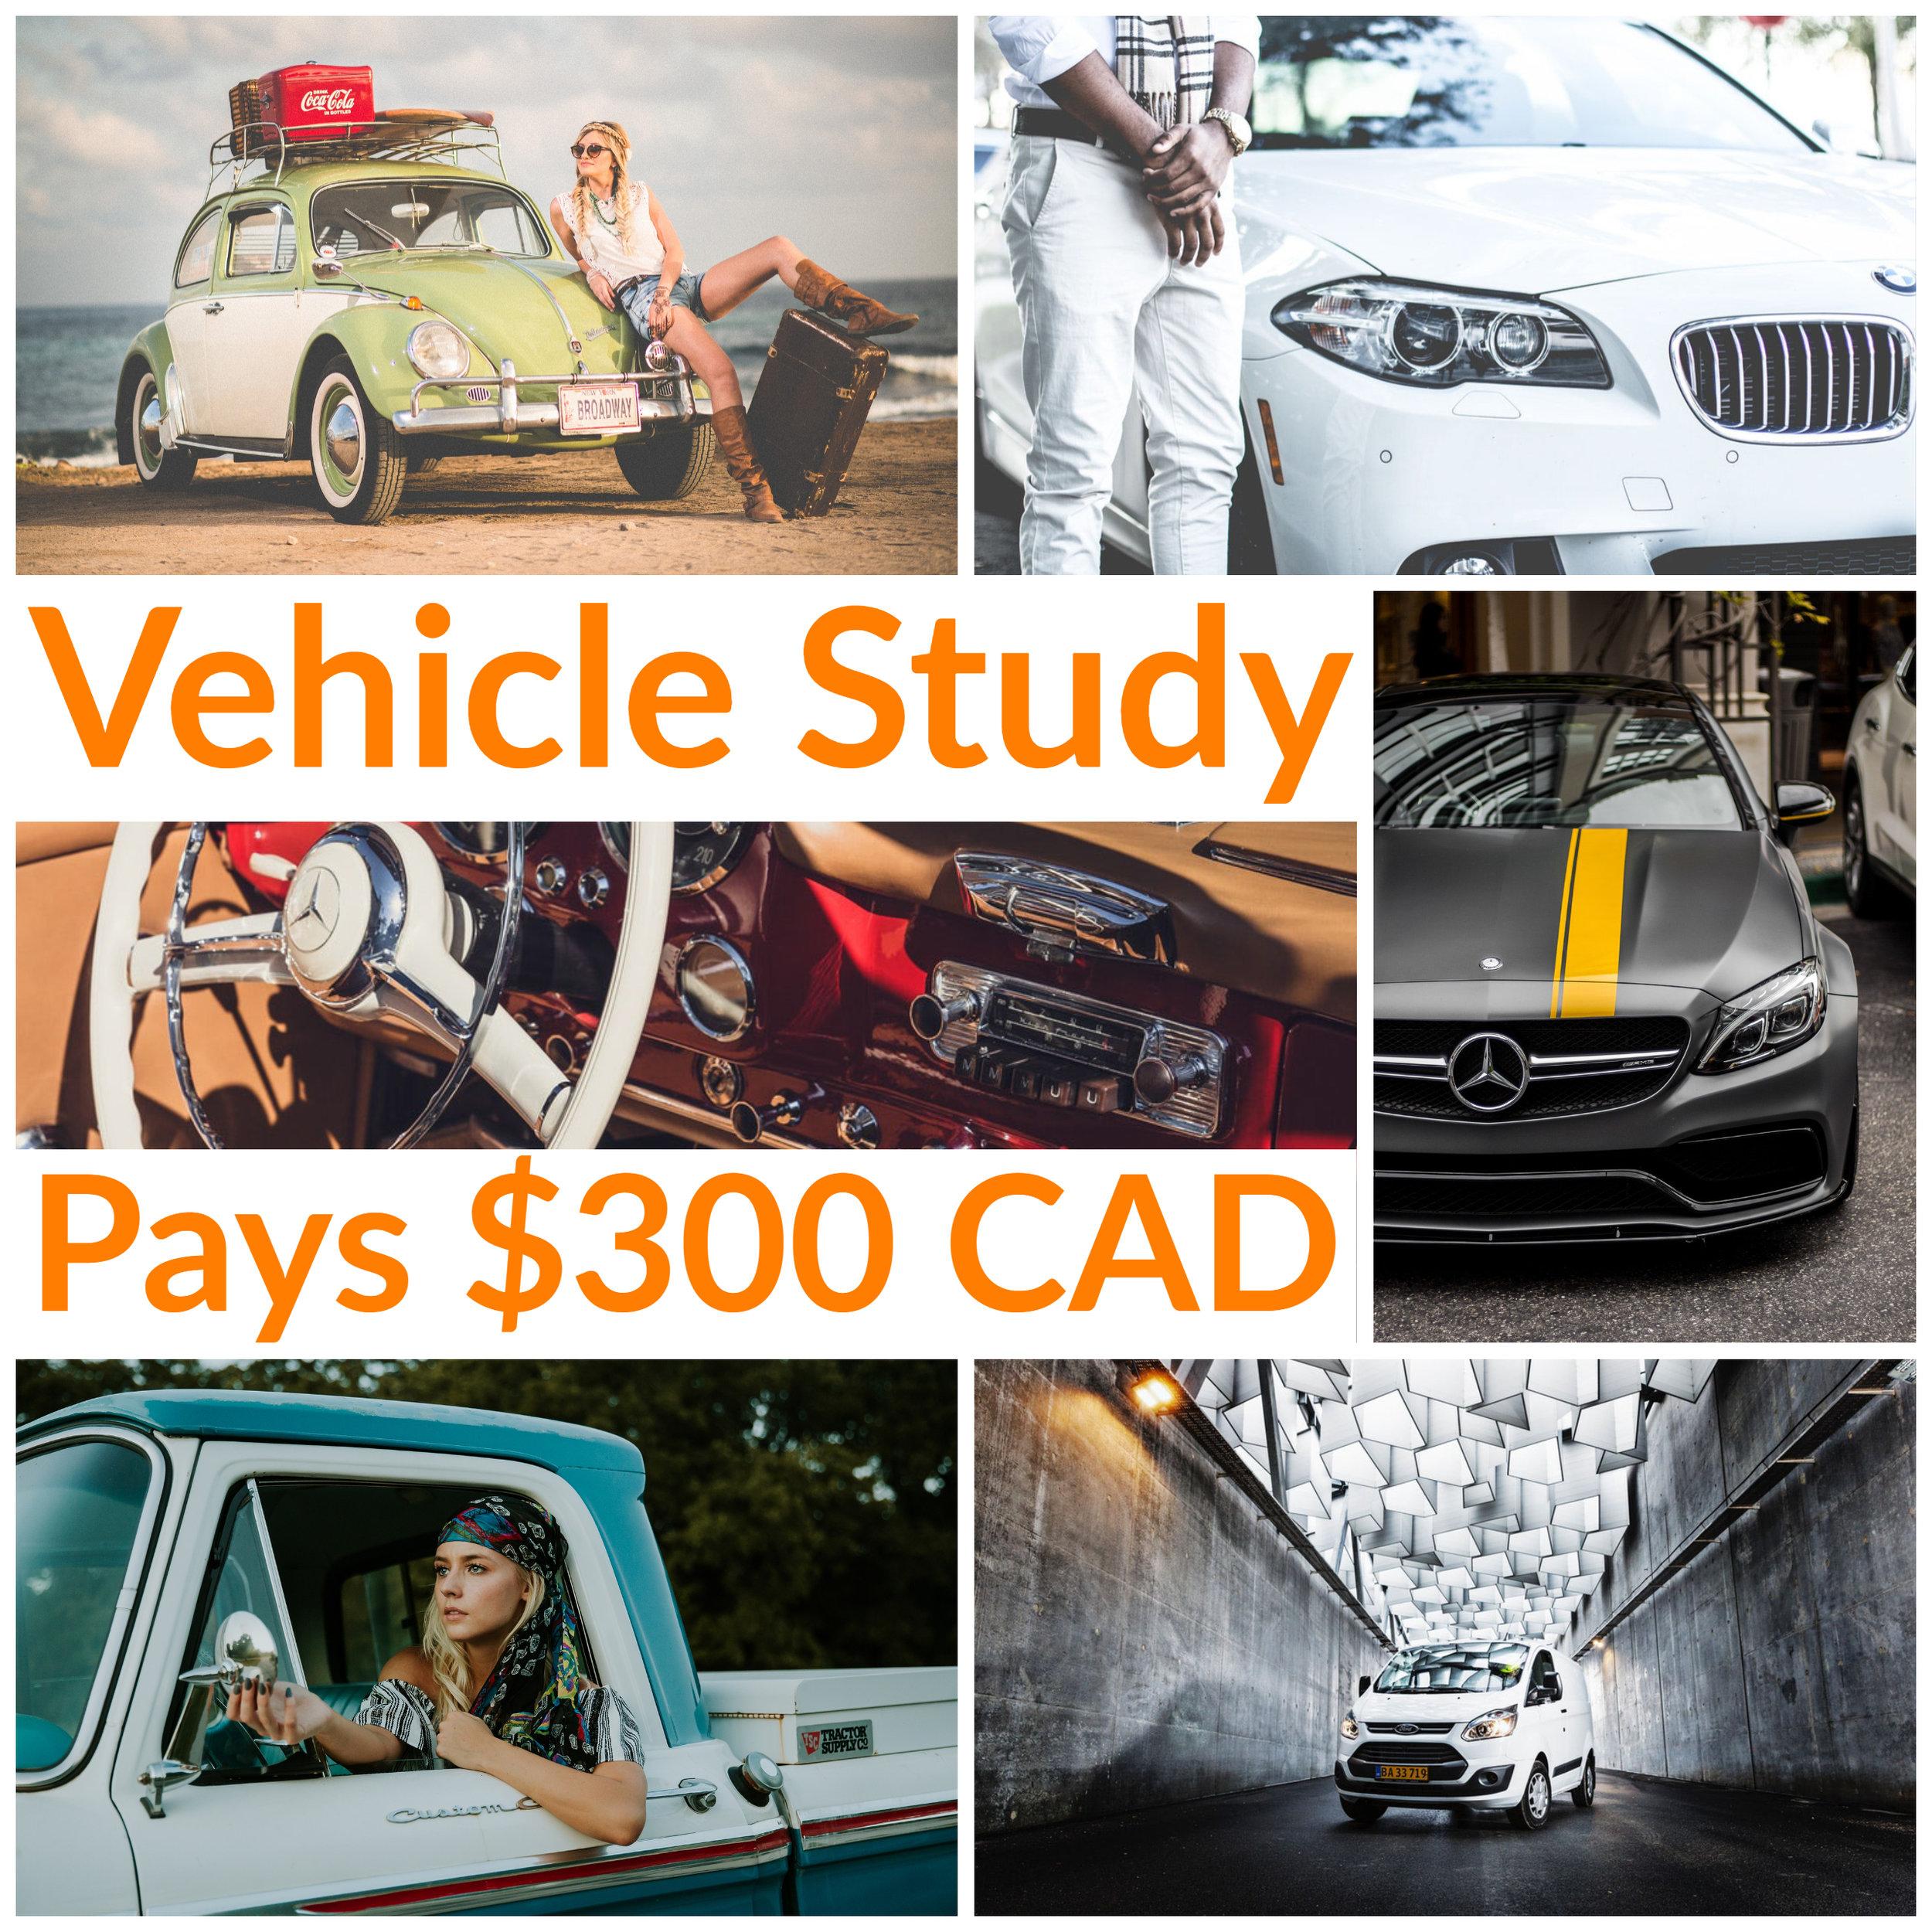 Gold & Gold - Vehicle Study.jpg